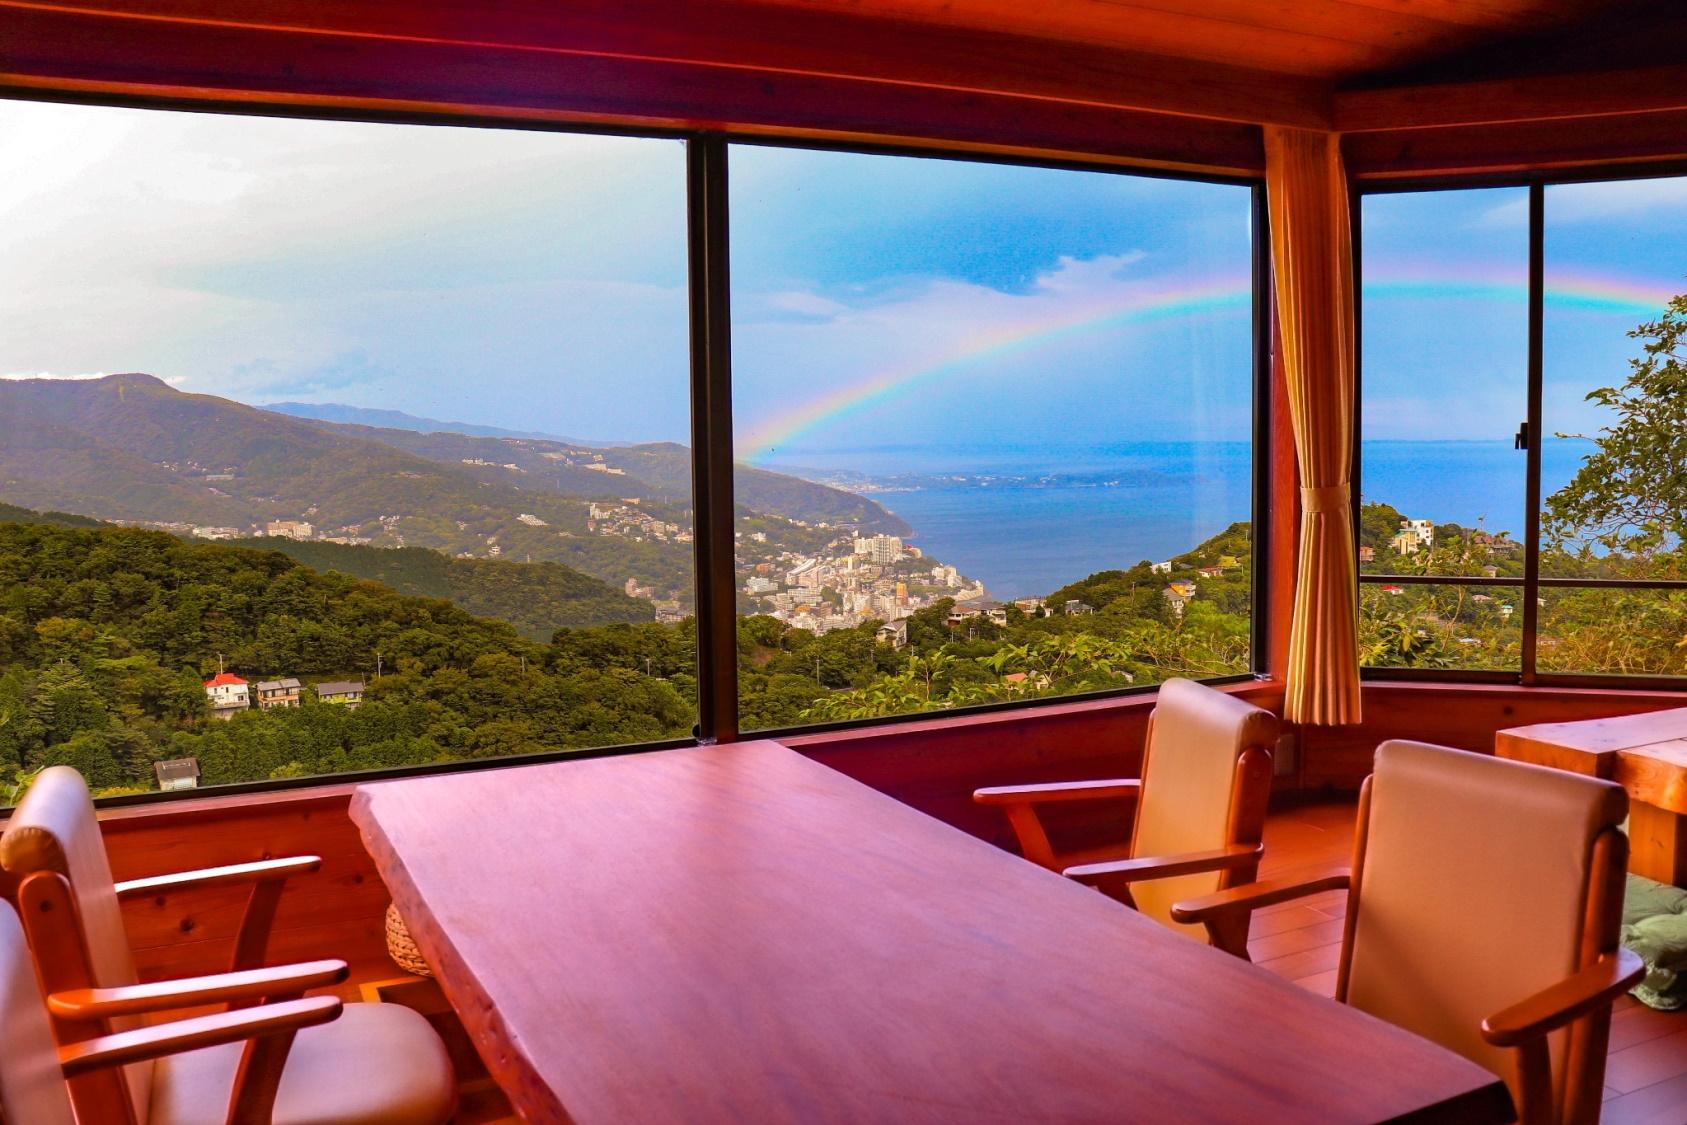 San en Sou - 山縁荘【Vacation STAY提供】の施設画像